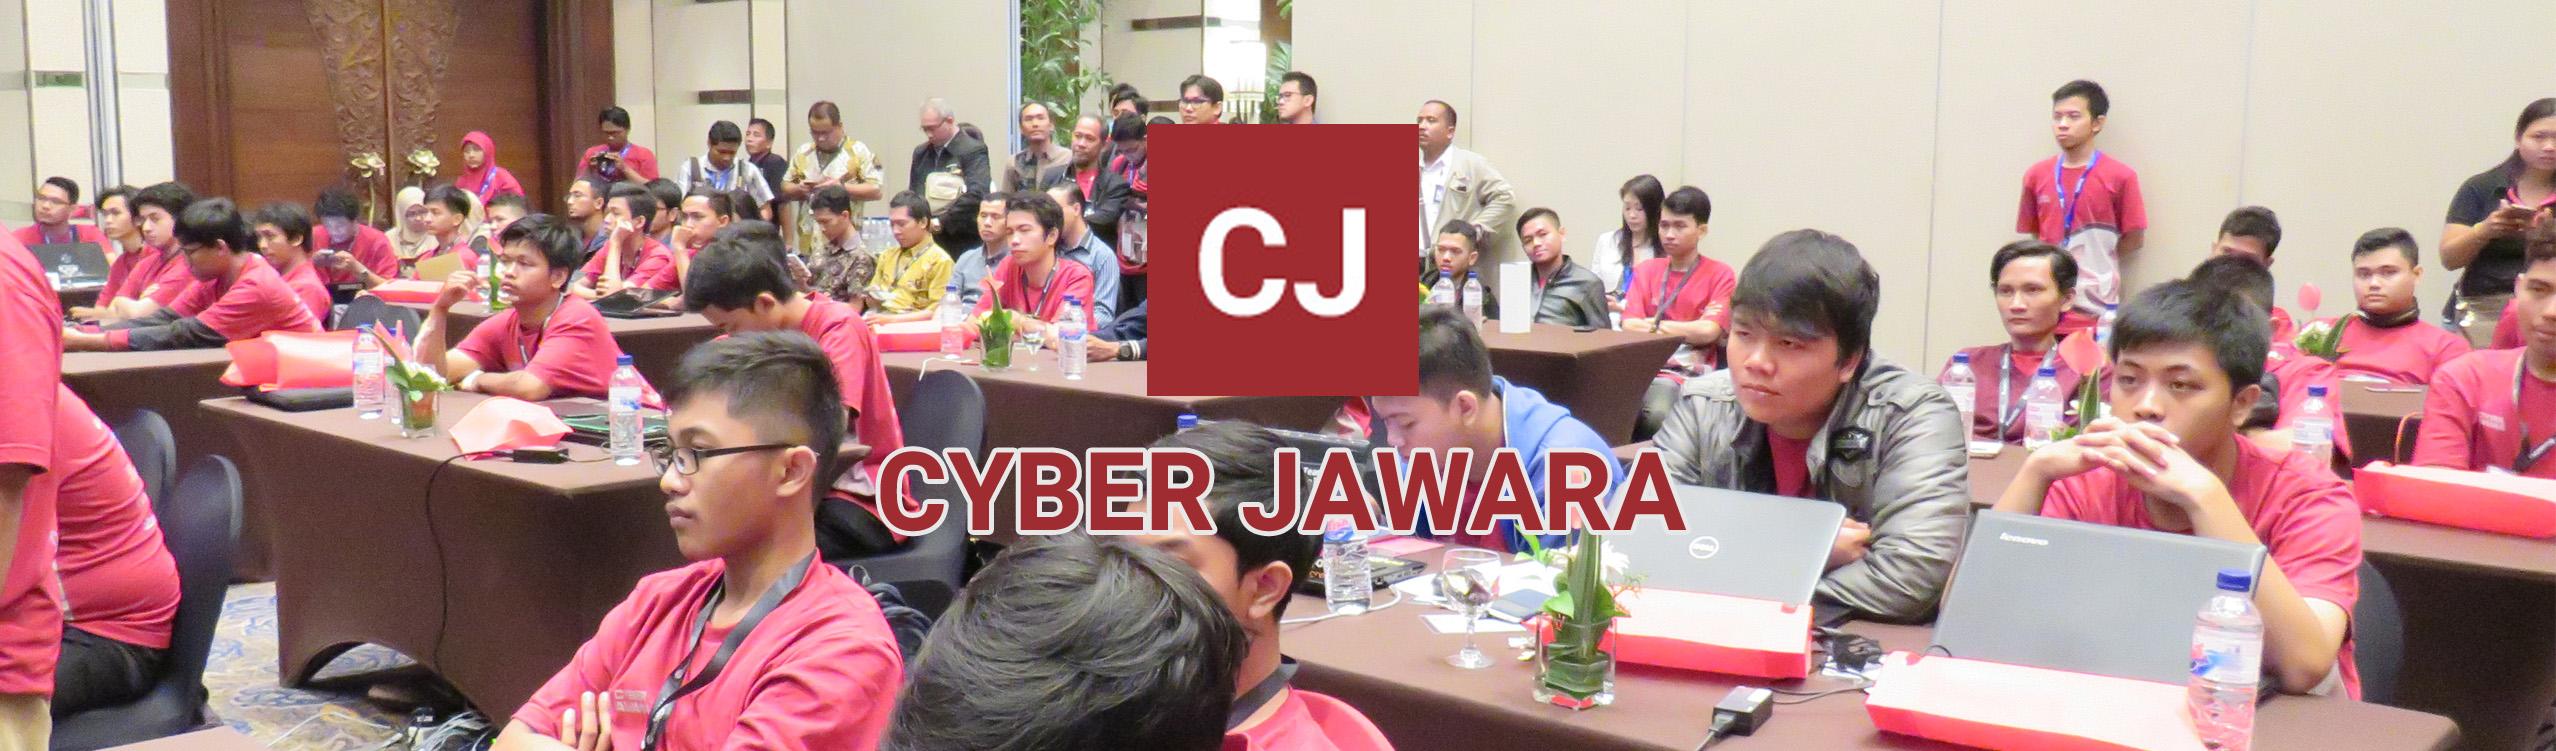 cyber jawara